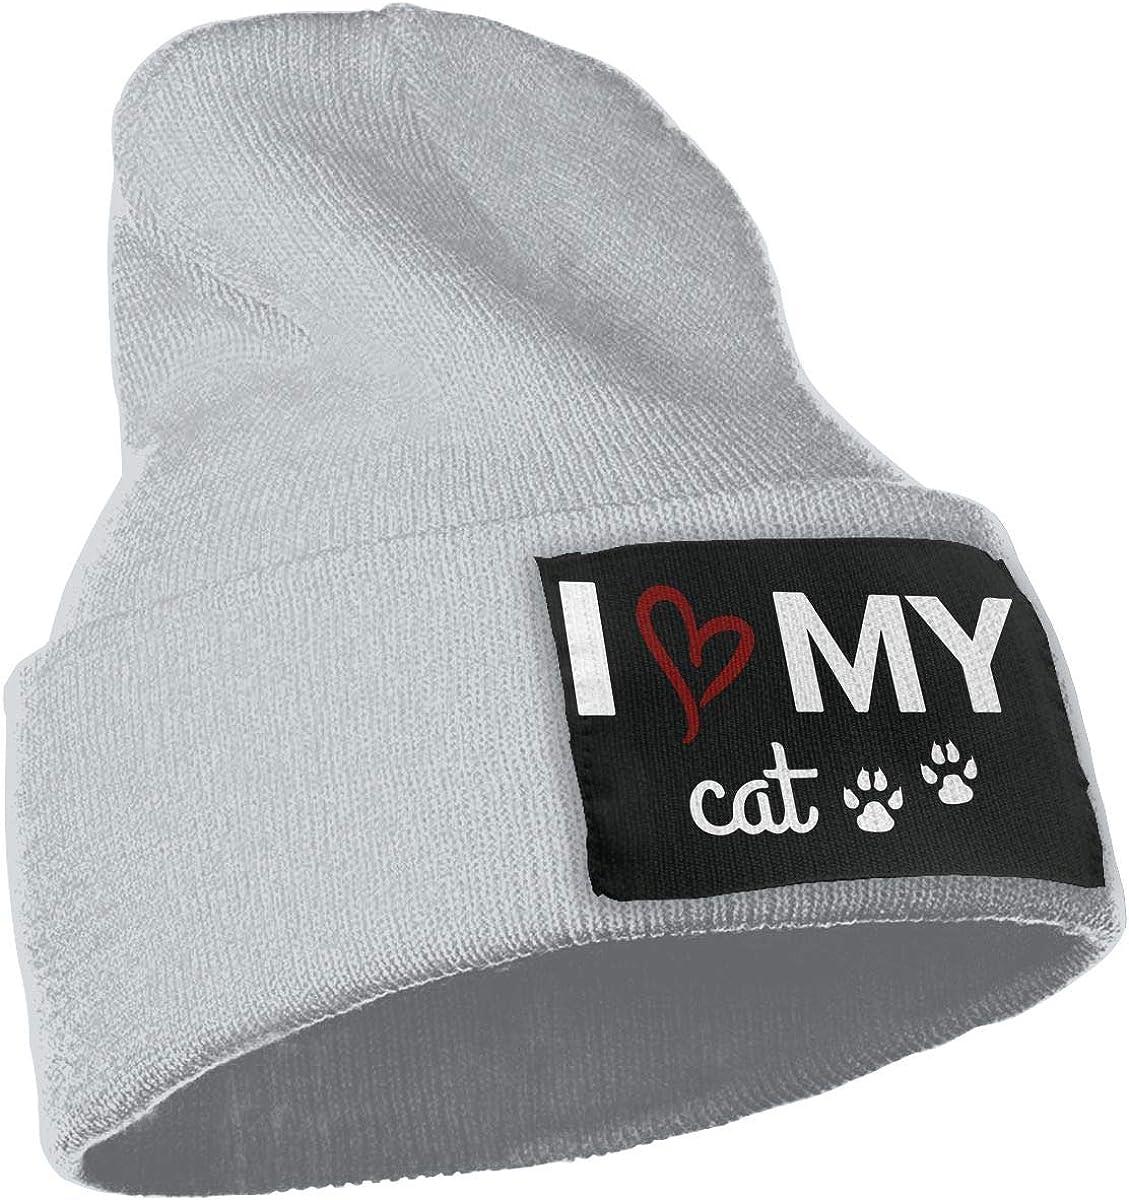 I Love My Cat Warm Winter Hat Knit Beanie Skull Cap Cuff Beanie Hat Winter Hats for Men /& Women